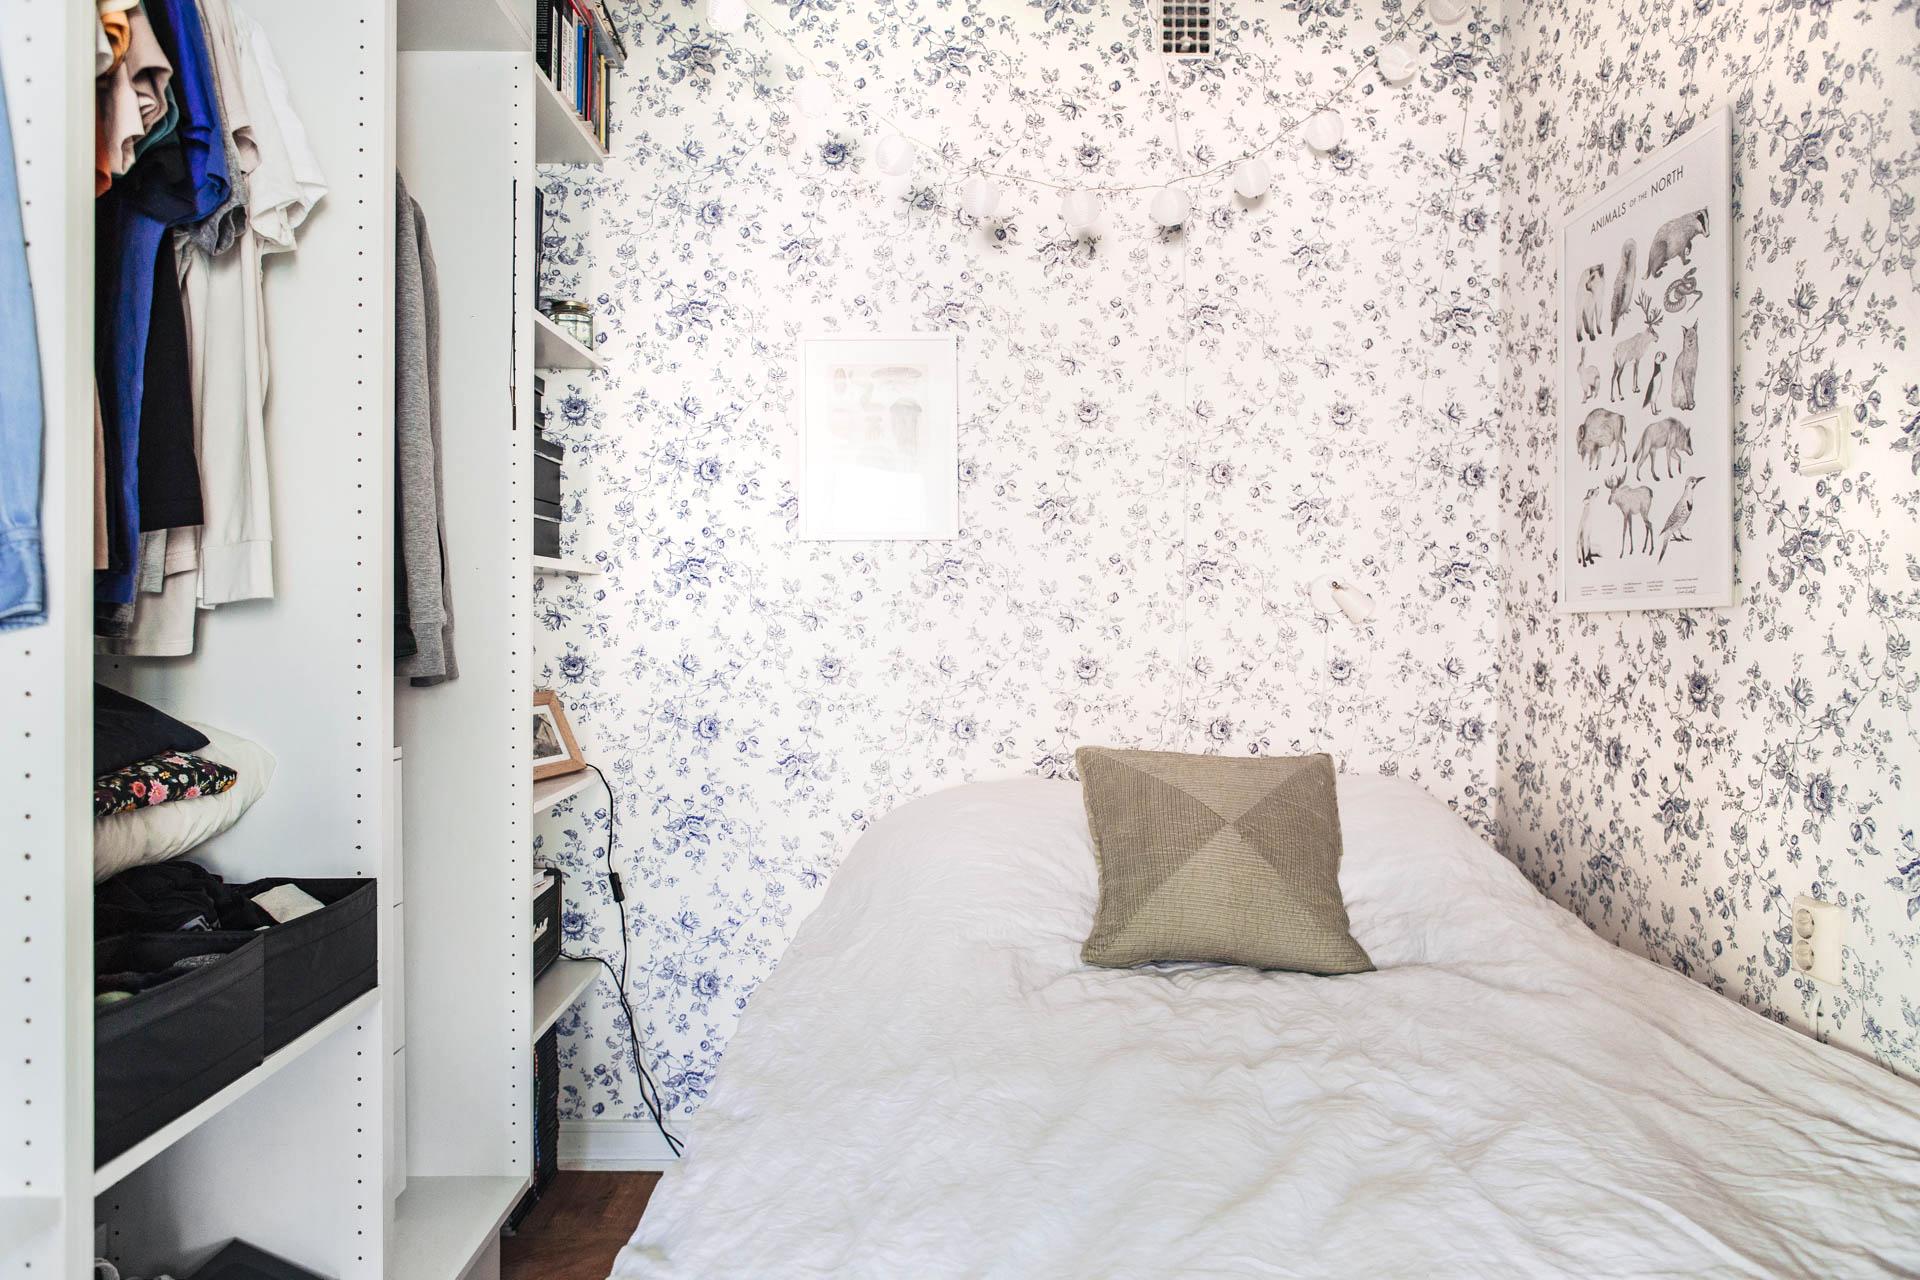 Kleine Slaapkamer Kledingkast : Kleine vintage slaapkamer met open kledingkastinterieur inrichting